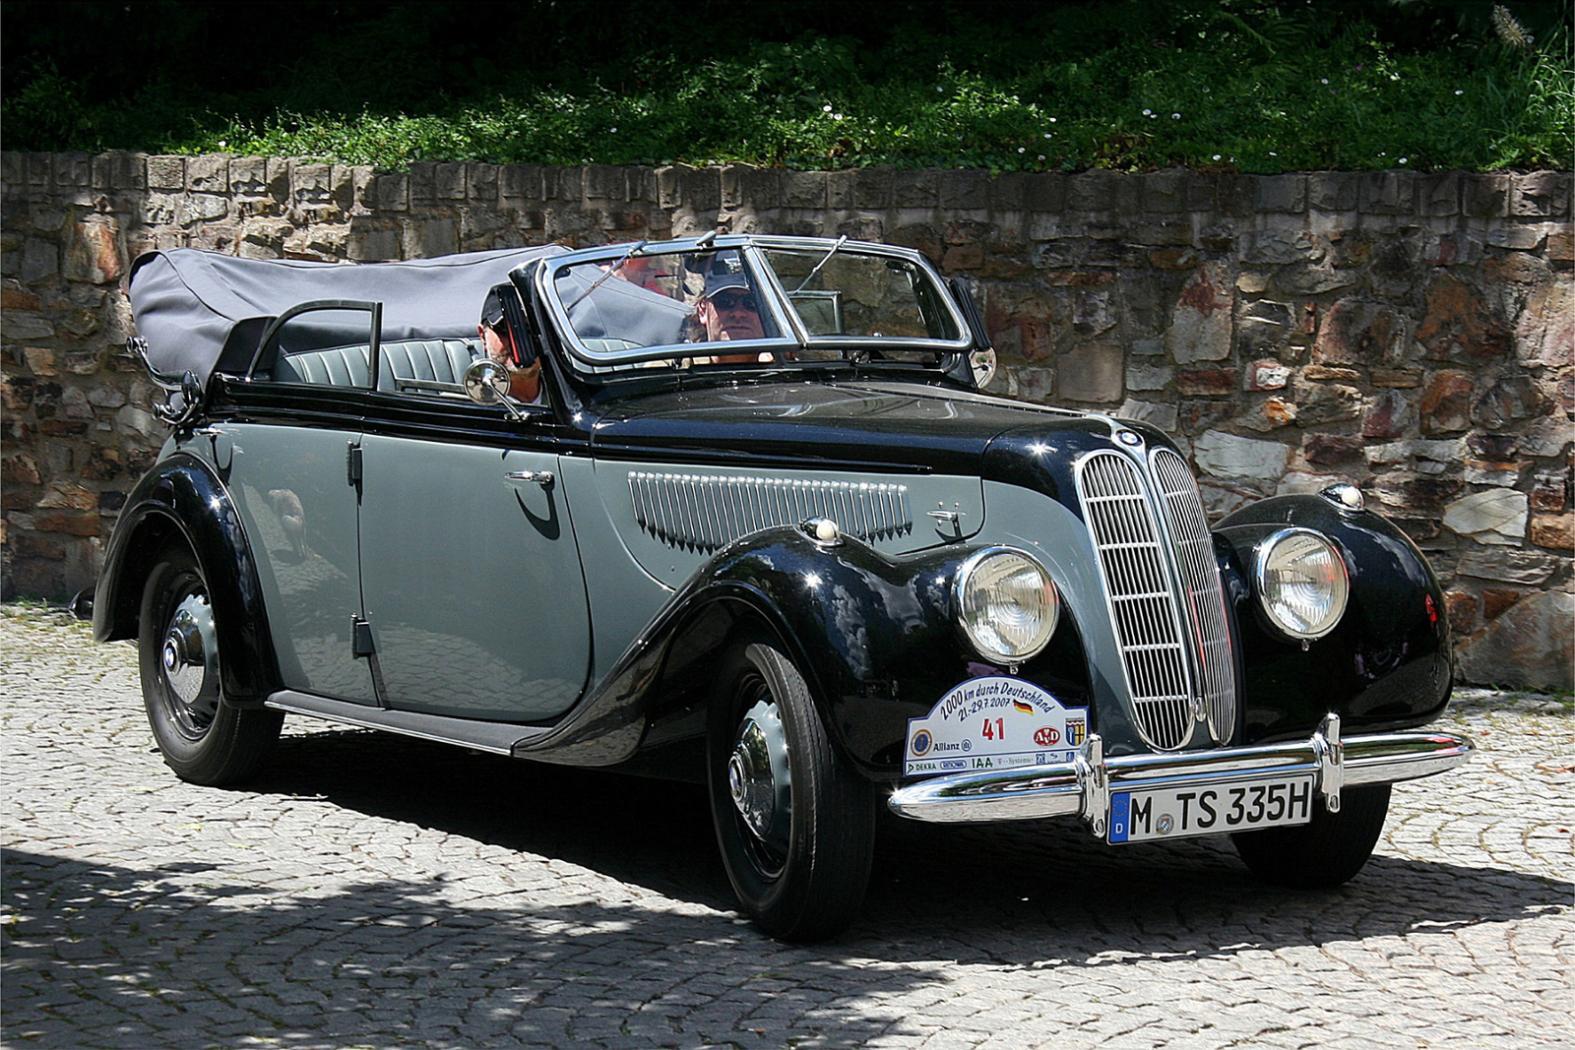 Moteurs-BMW-six-cylindres-en-ligne-3.jpeg